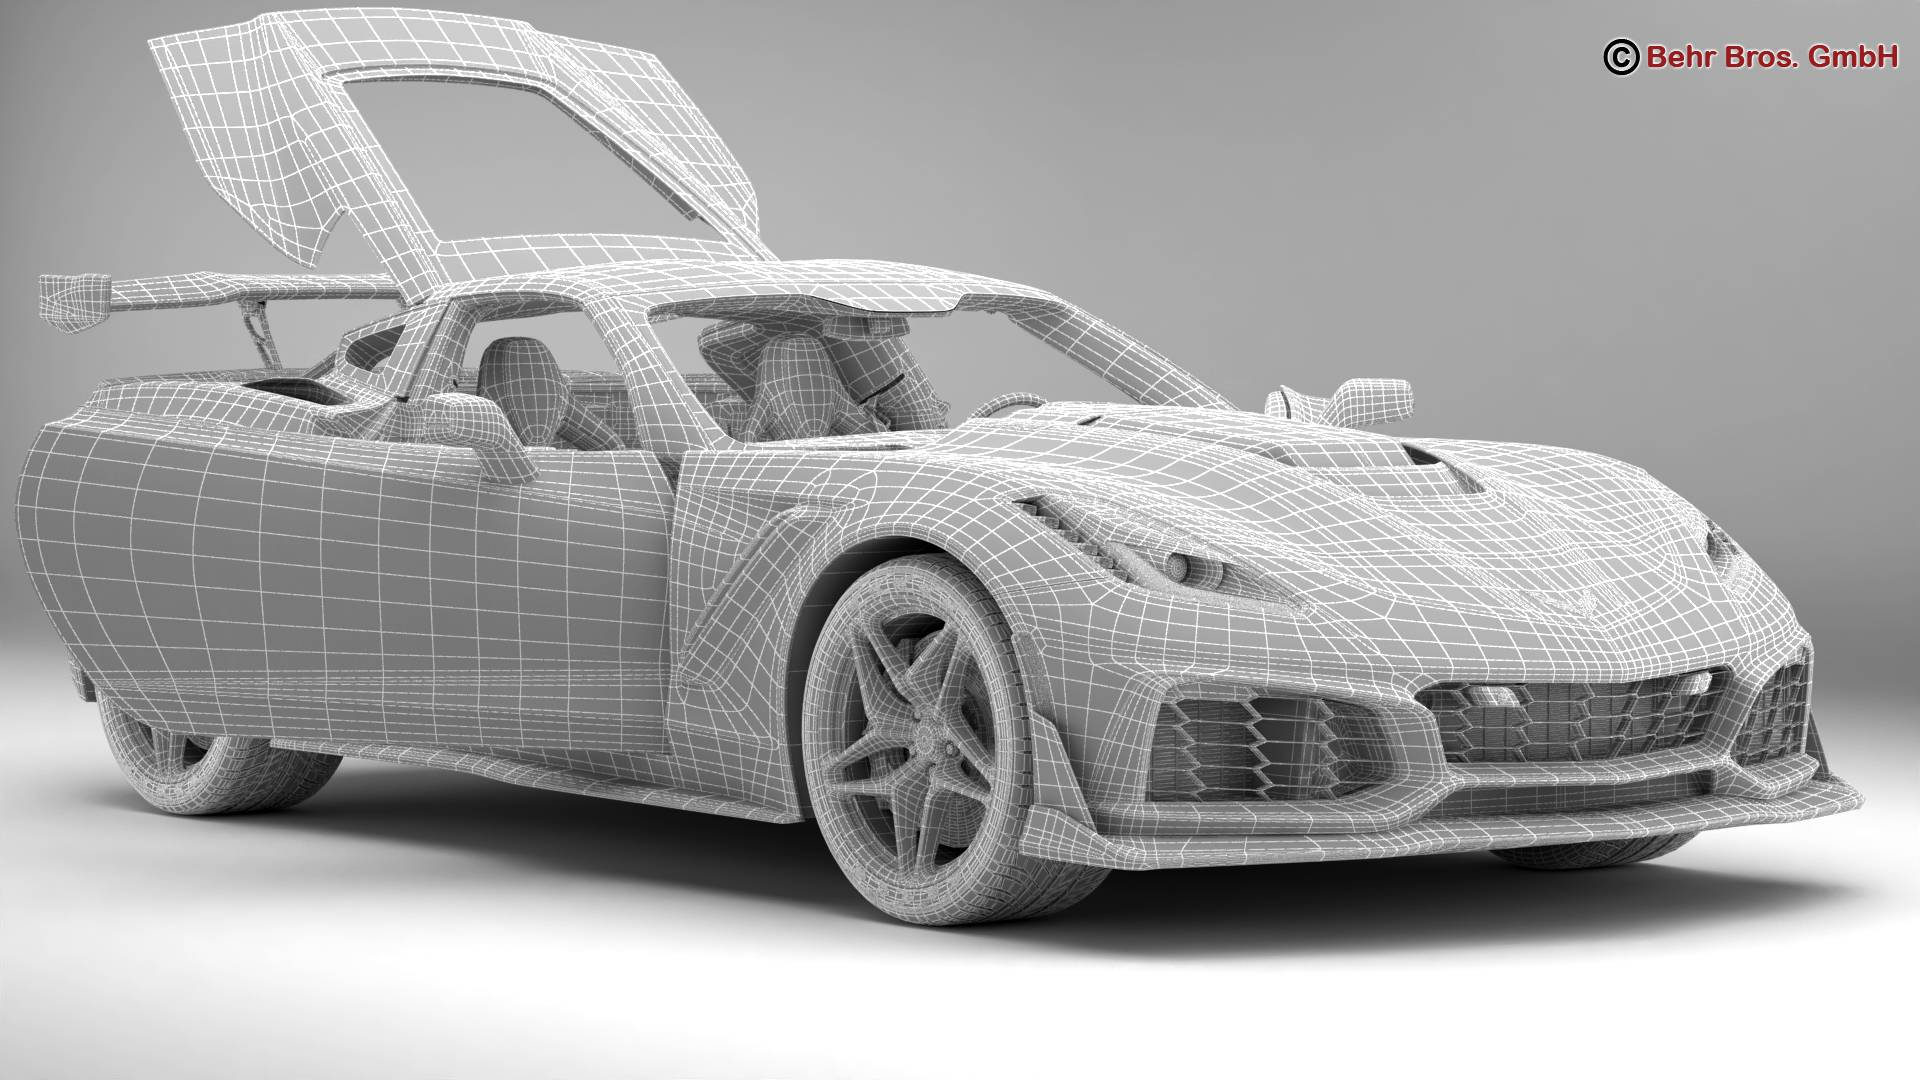 chevrolet corvette zr1 2019 3d model 3ds max fbx c4d lwo ma mb obj 275983